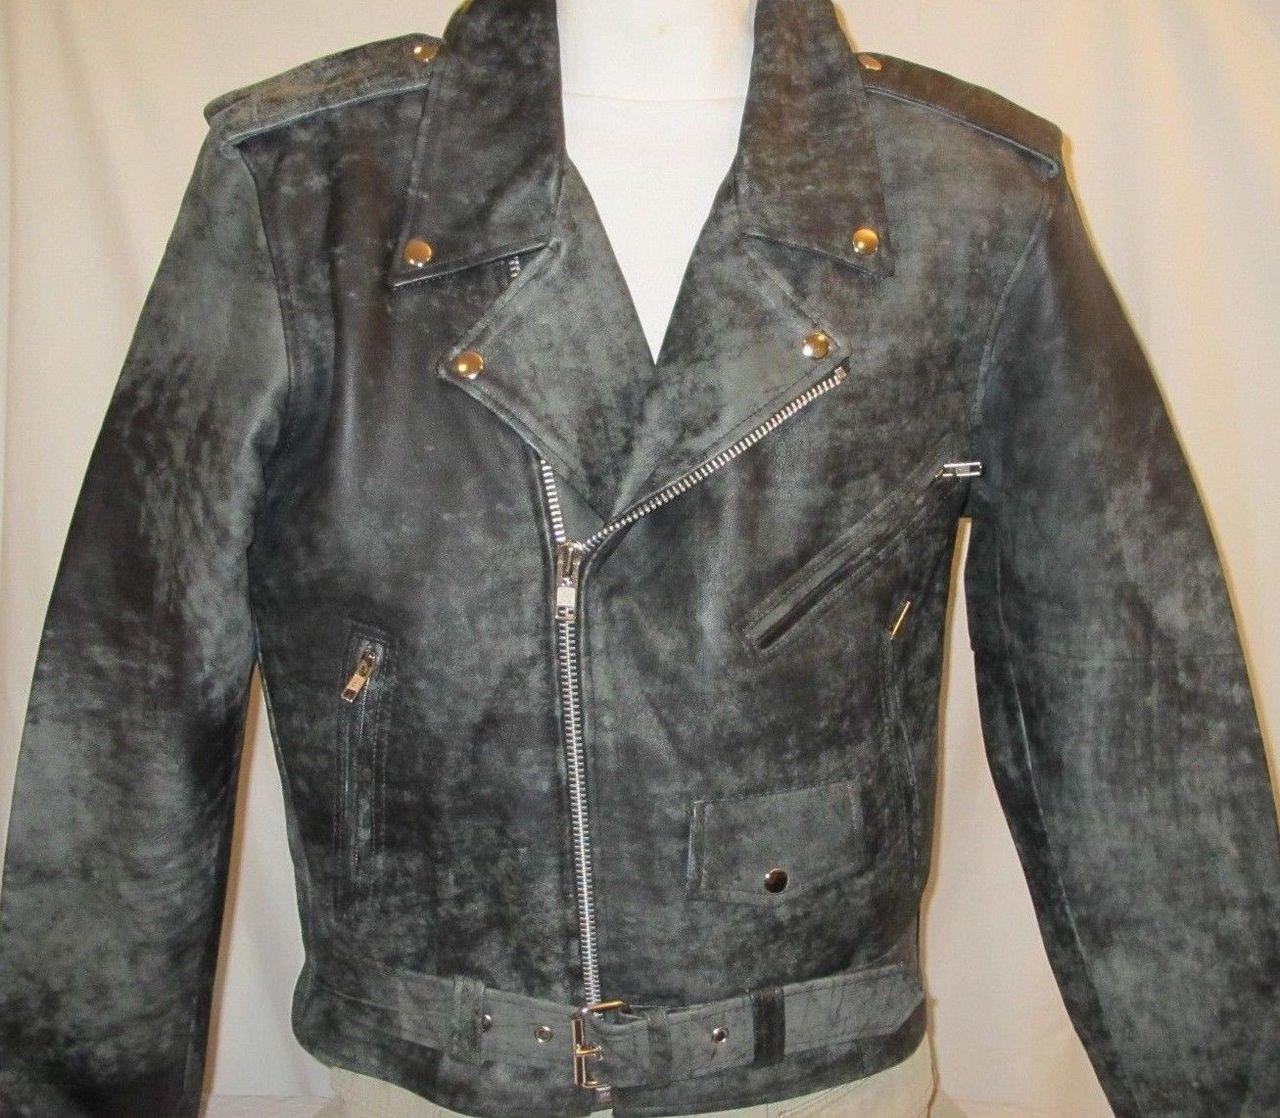 Distressed Black Leather Motorcycle Biker Jacket Mens W Gun Pocket